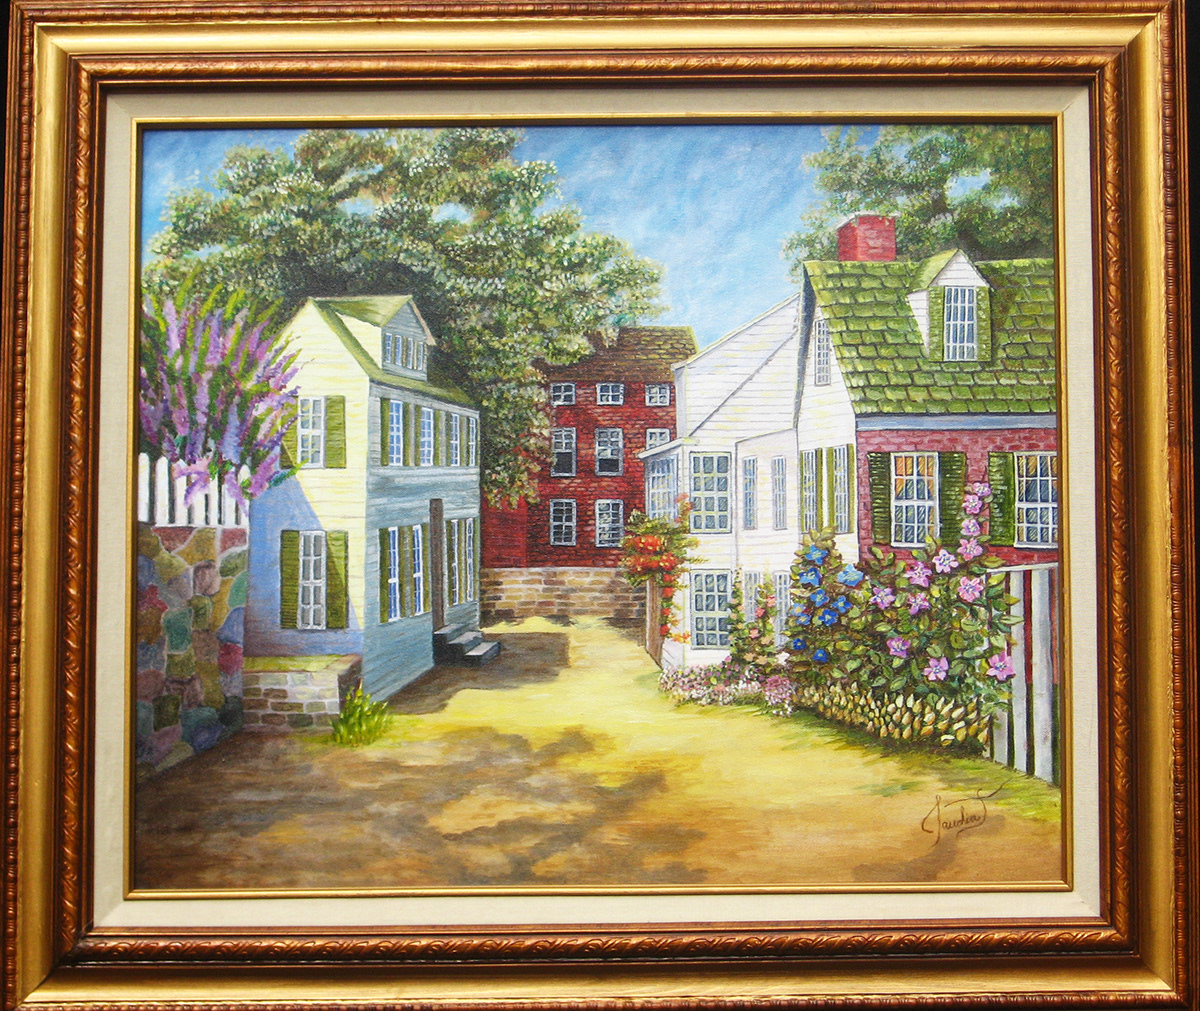 art exhibits comission colorful illuminate impressionist Kinkaid Monet lake Dog painting streetlight painting